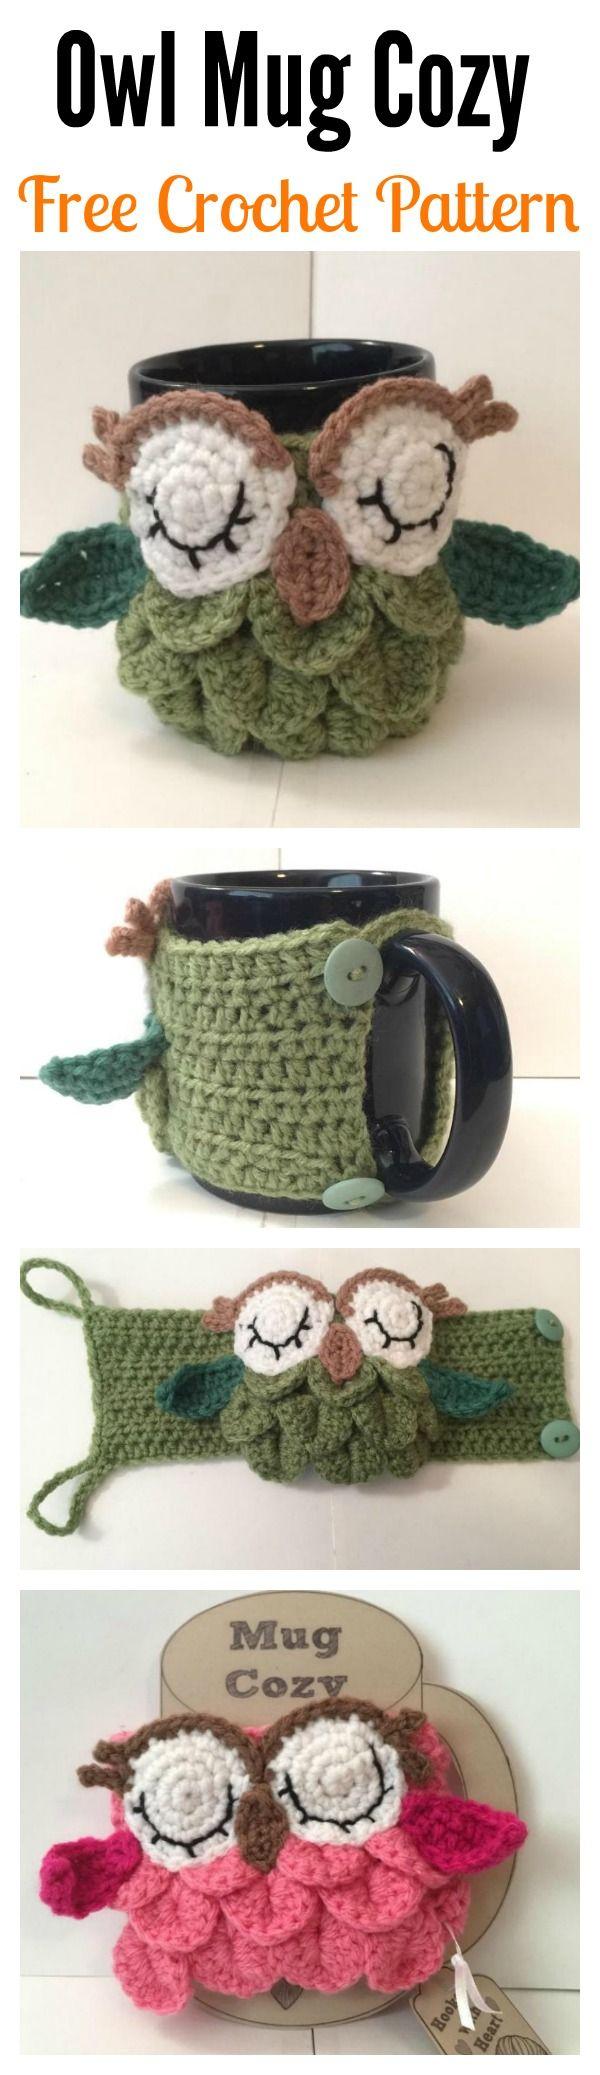 Crochet Owl Mug Cozy Free Patterns | Pinterest | Häkelarbeiten ...